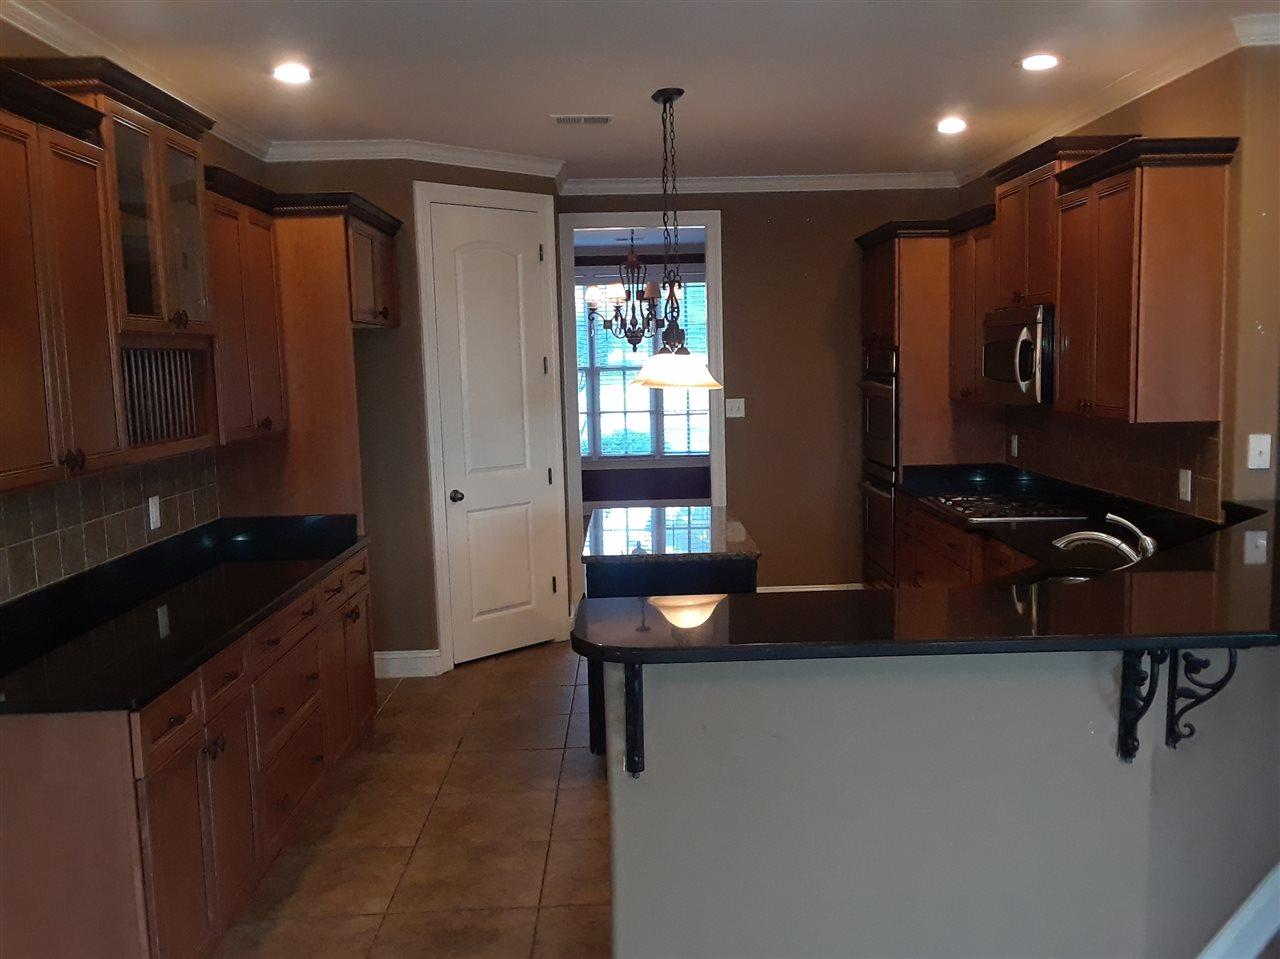 1010 E Old Hearthstone Collierville, TN 38017 - MLS #: 10026951